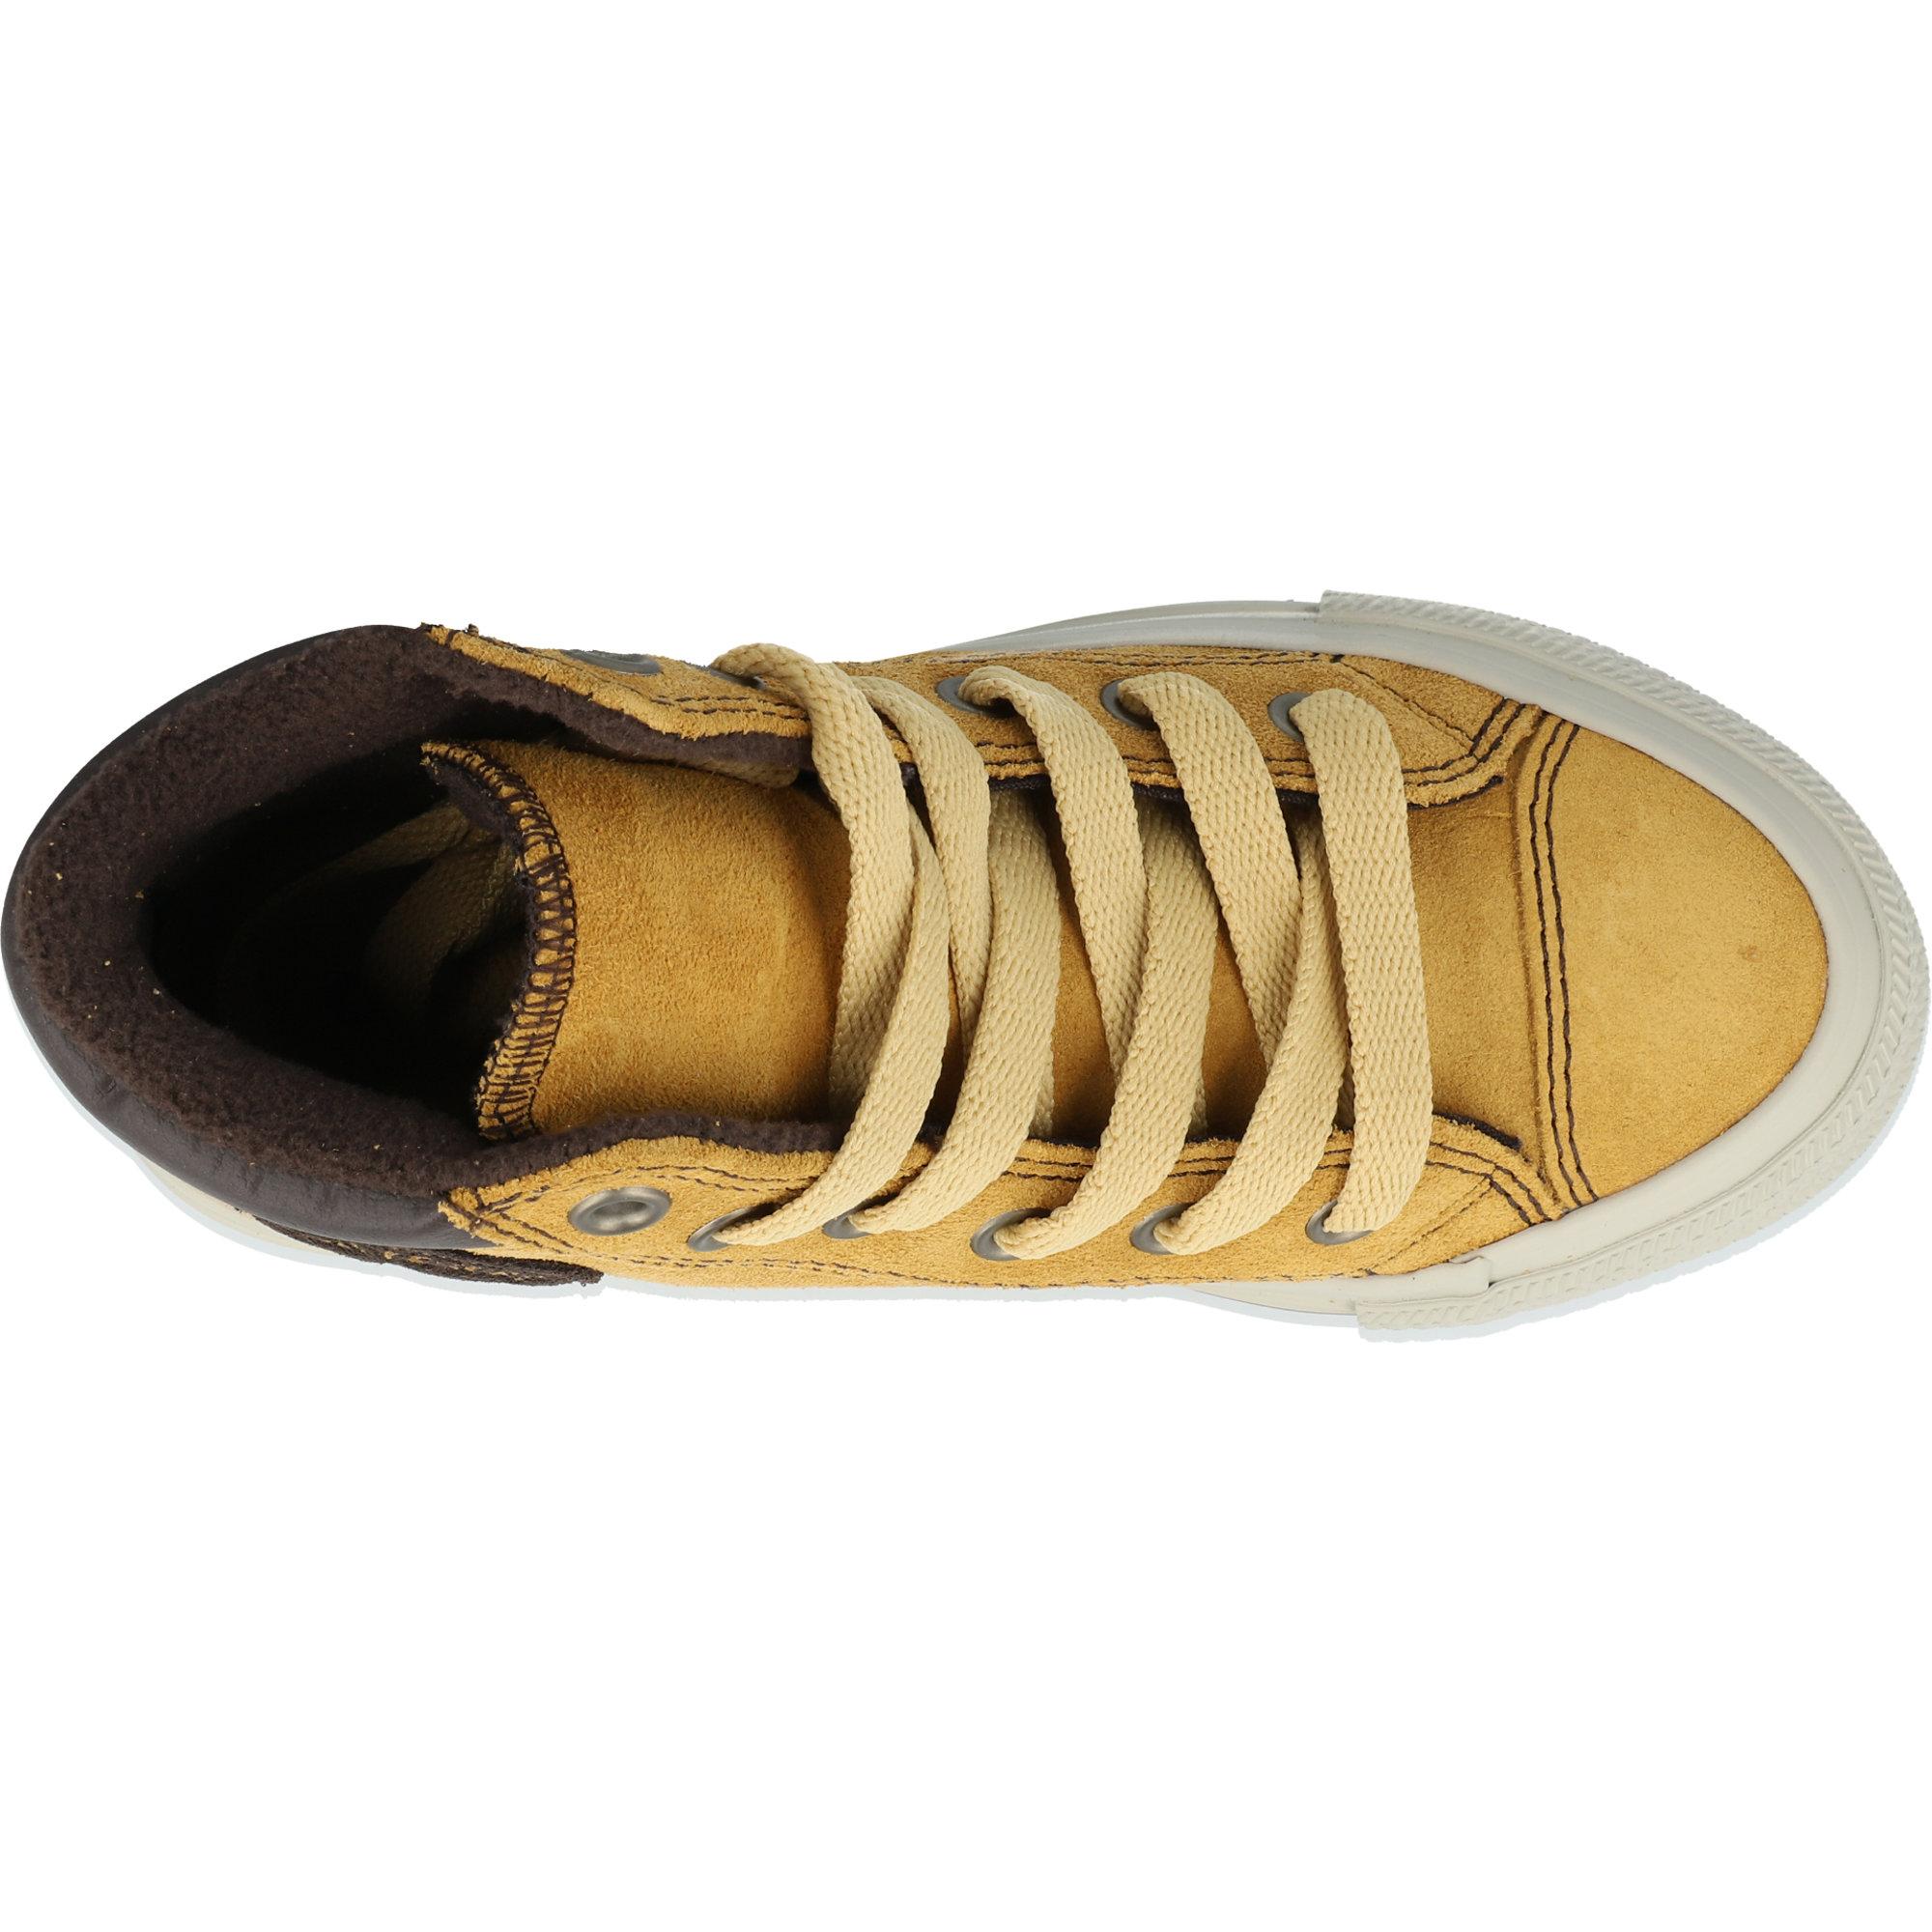 Converse Kids Chuck Taylor All Star 2v High Top Boot Sneaker